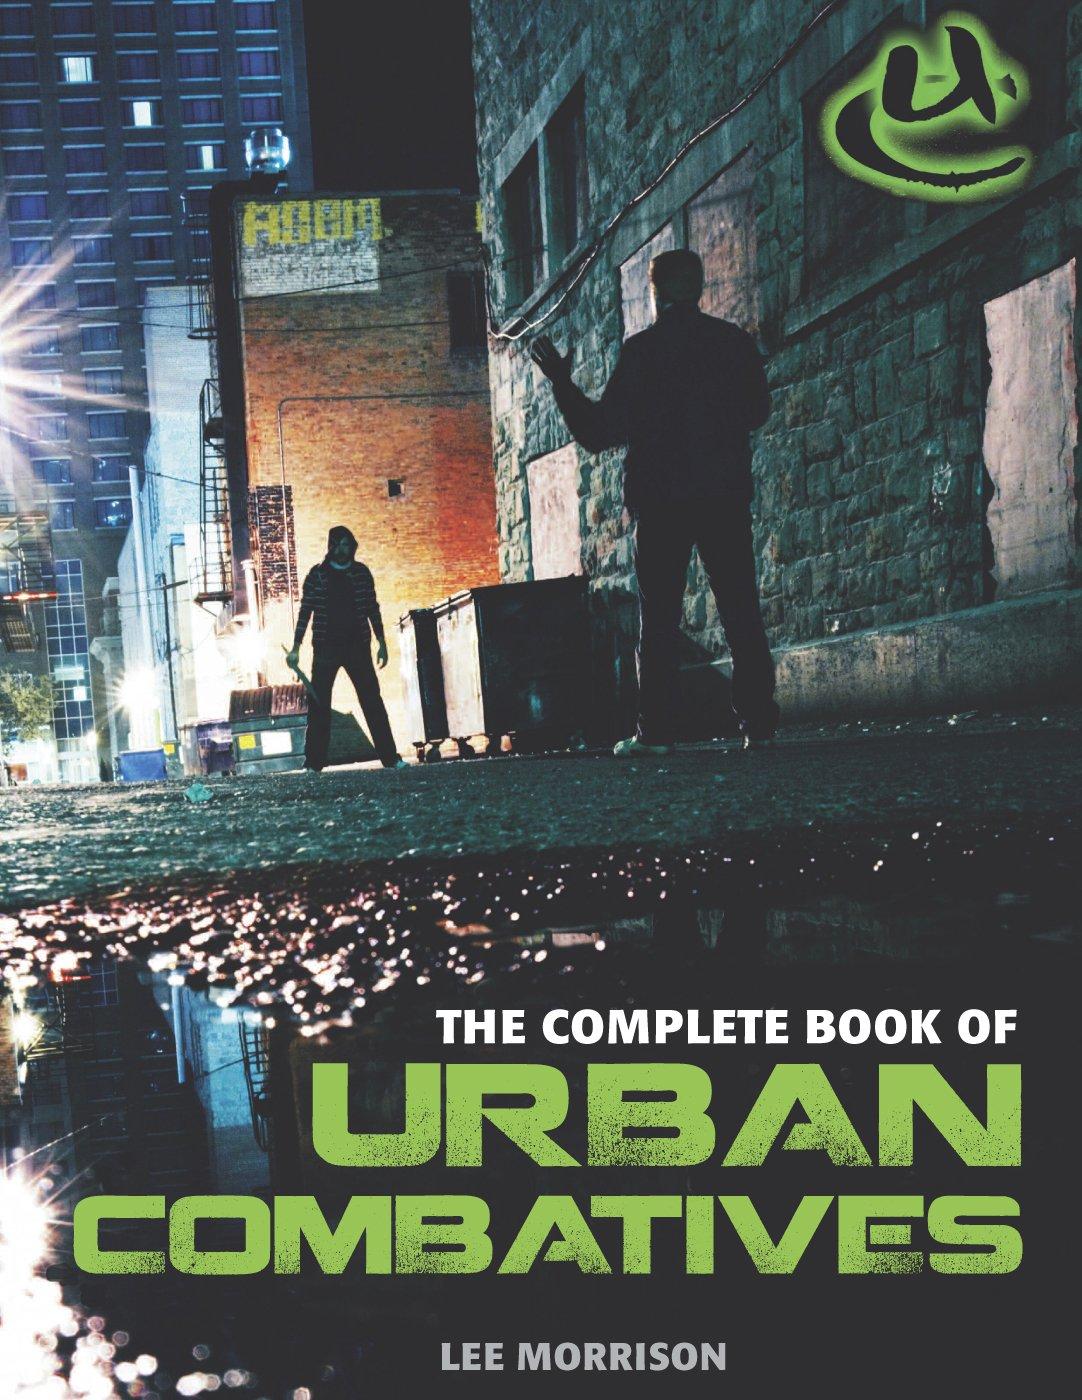 Complete Book of Urban Combatives: Amazon.es: Lee Morrison ...